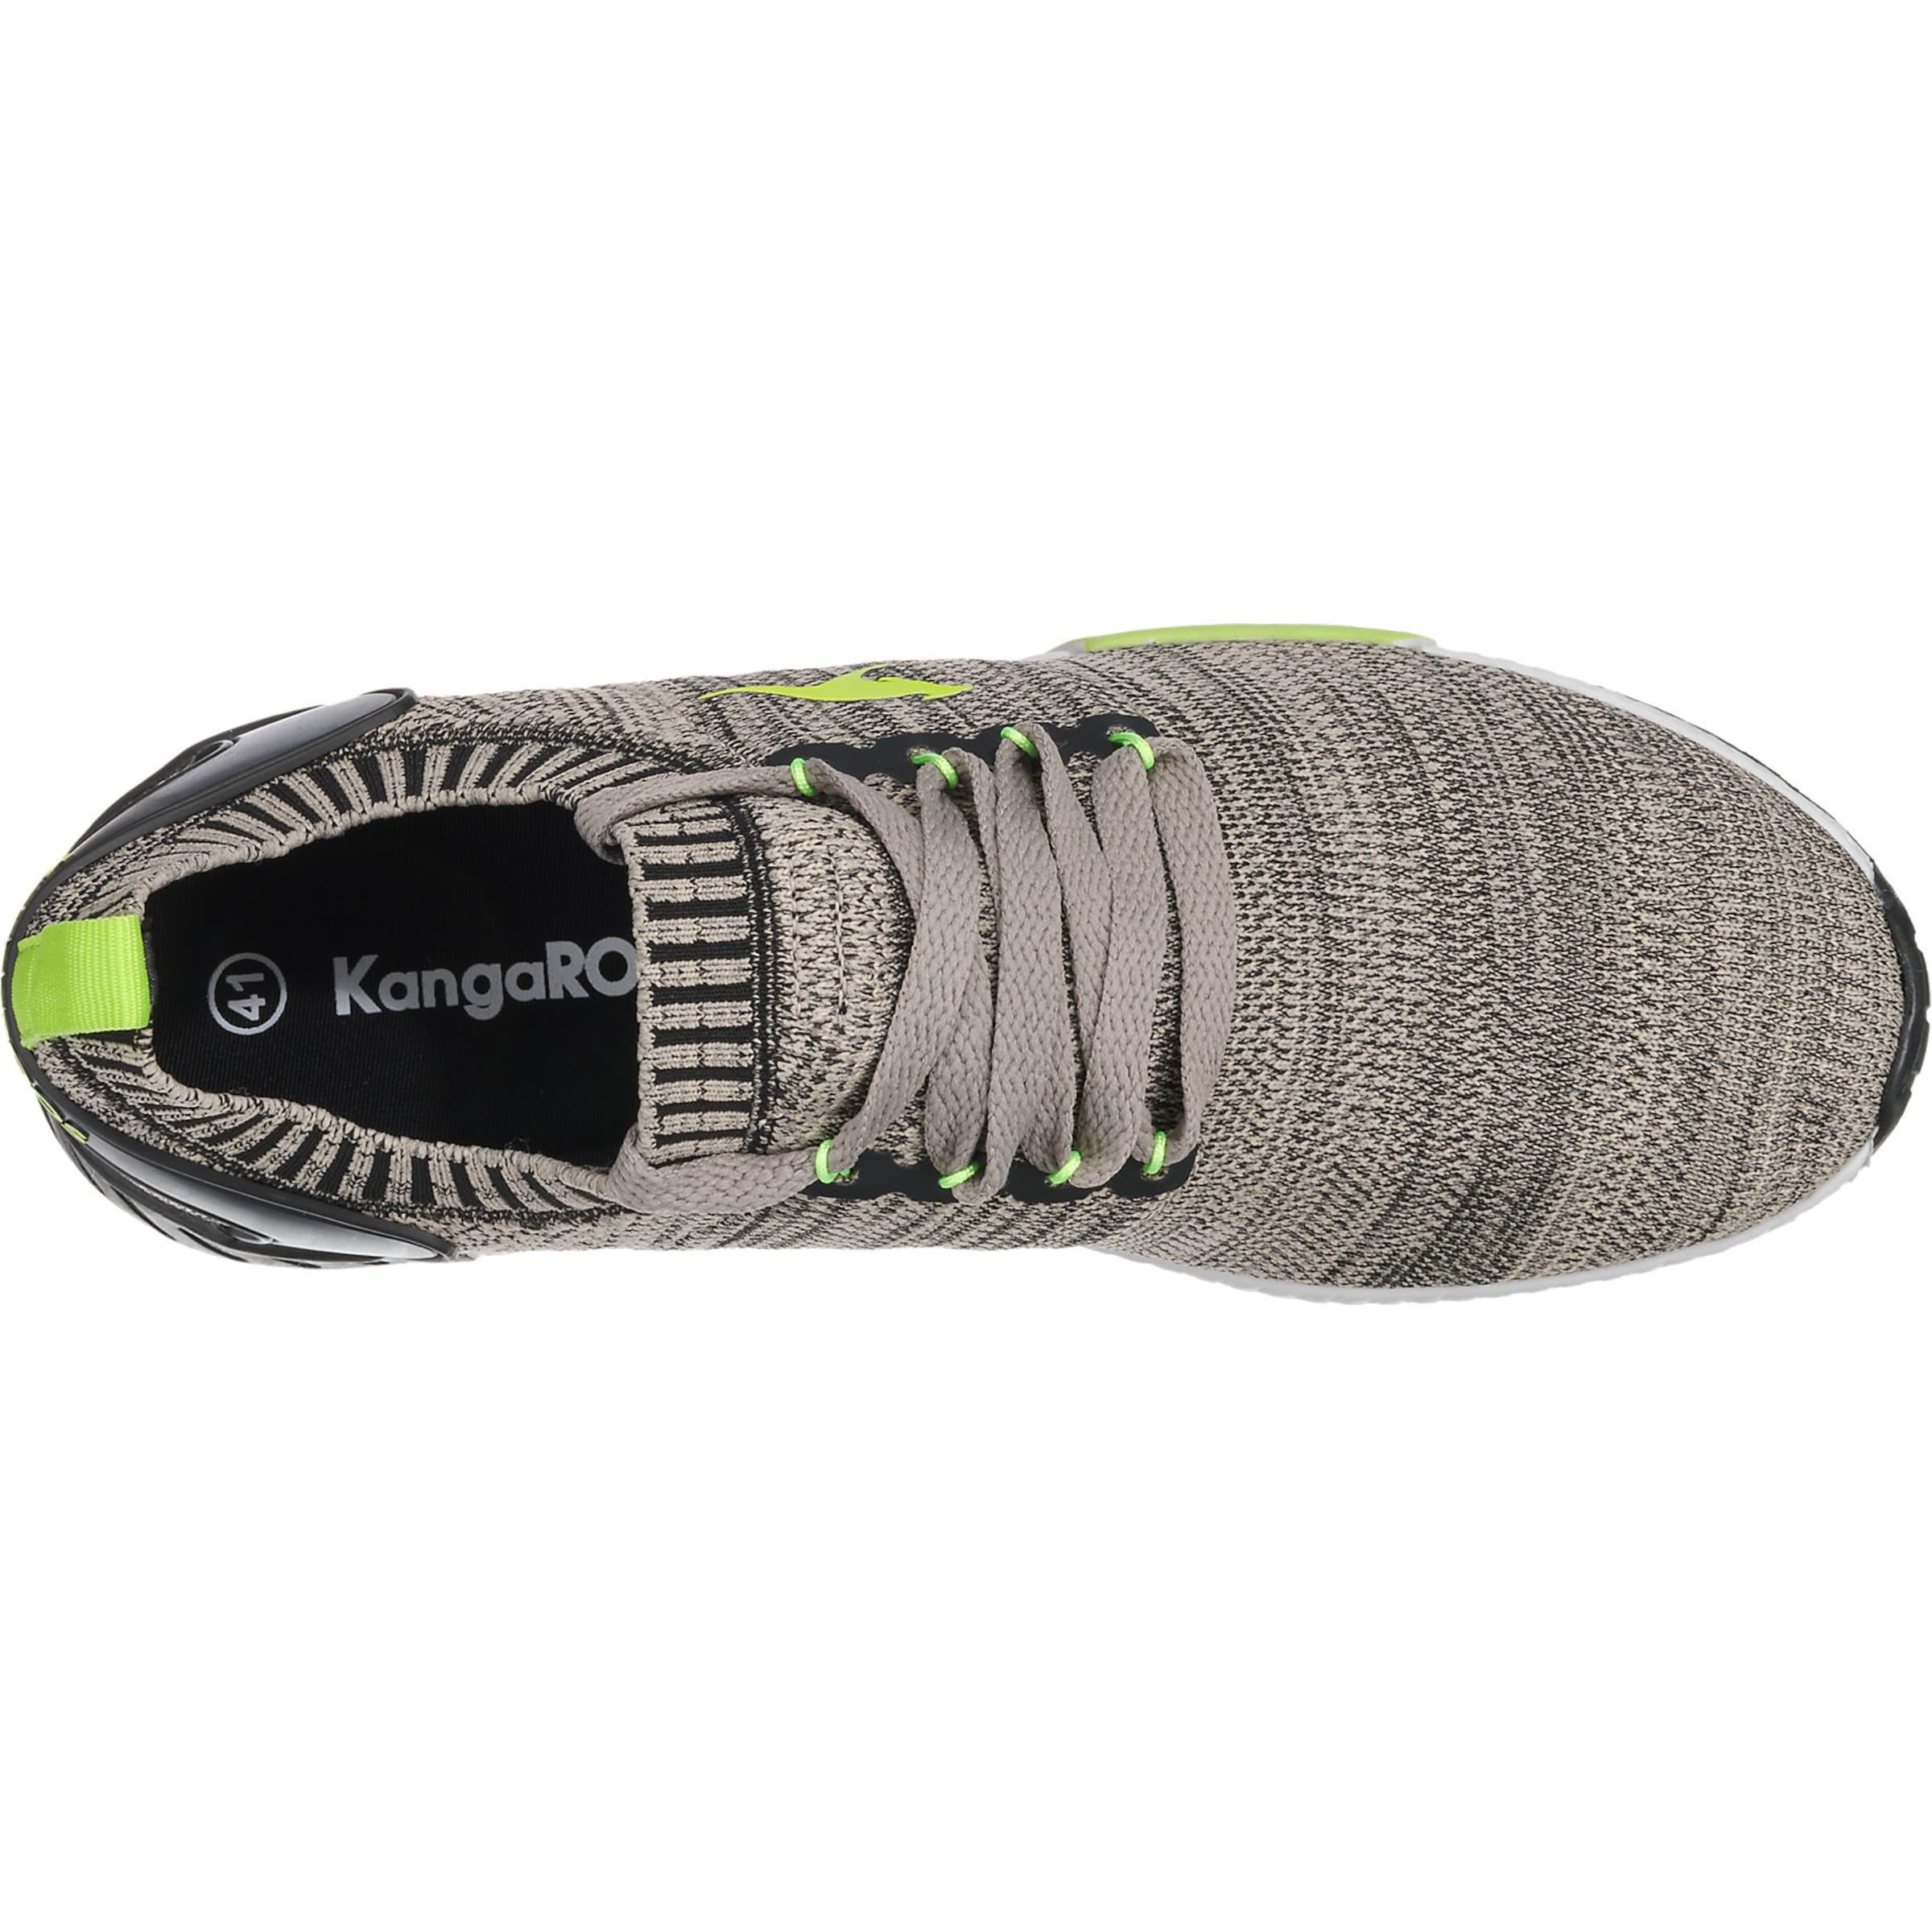 KangaROOS W-590 Turnschuhe Freizeitschuhe Low Textil Wilde Freizeitschuhe Turnschuhe d4365e